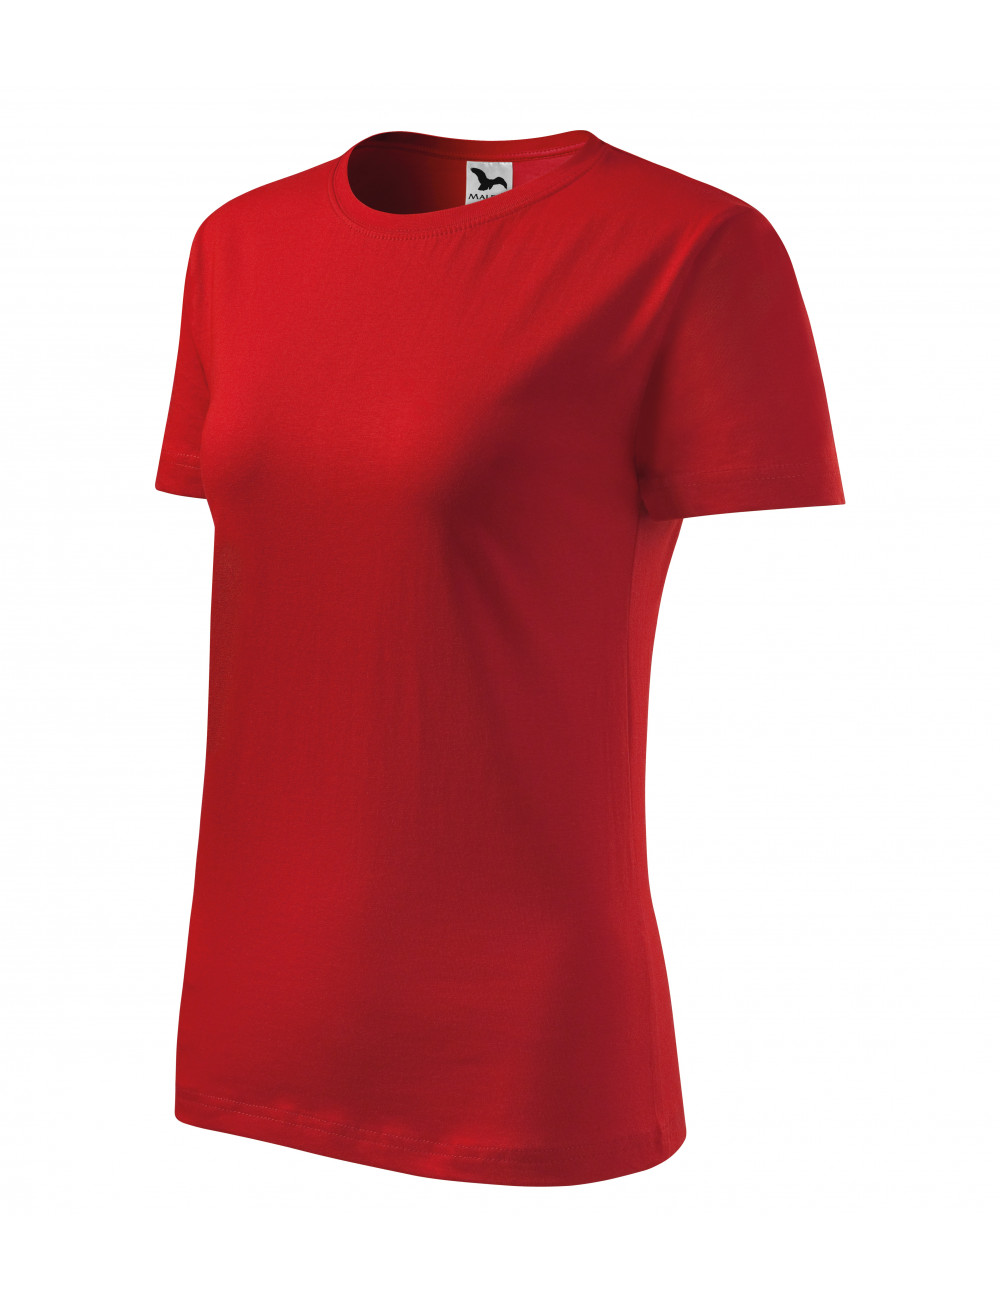 Adler MALFINI Koszulka damska Classic New 133 czerwony